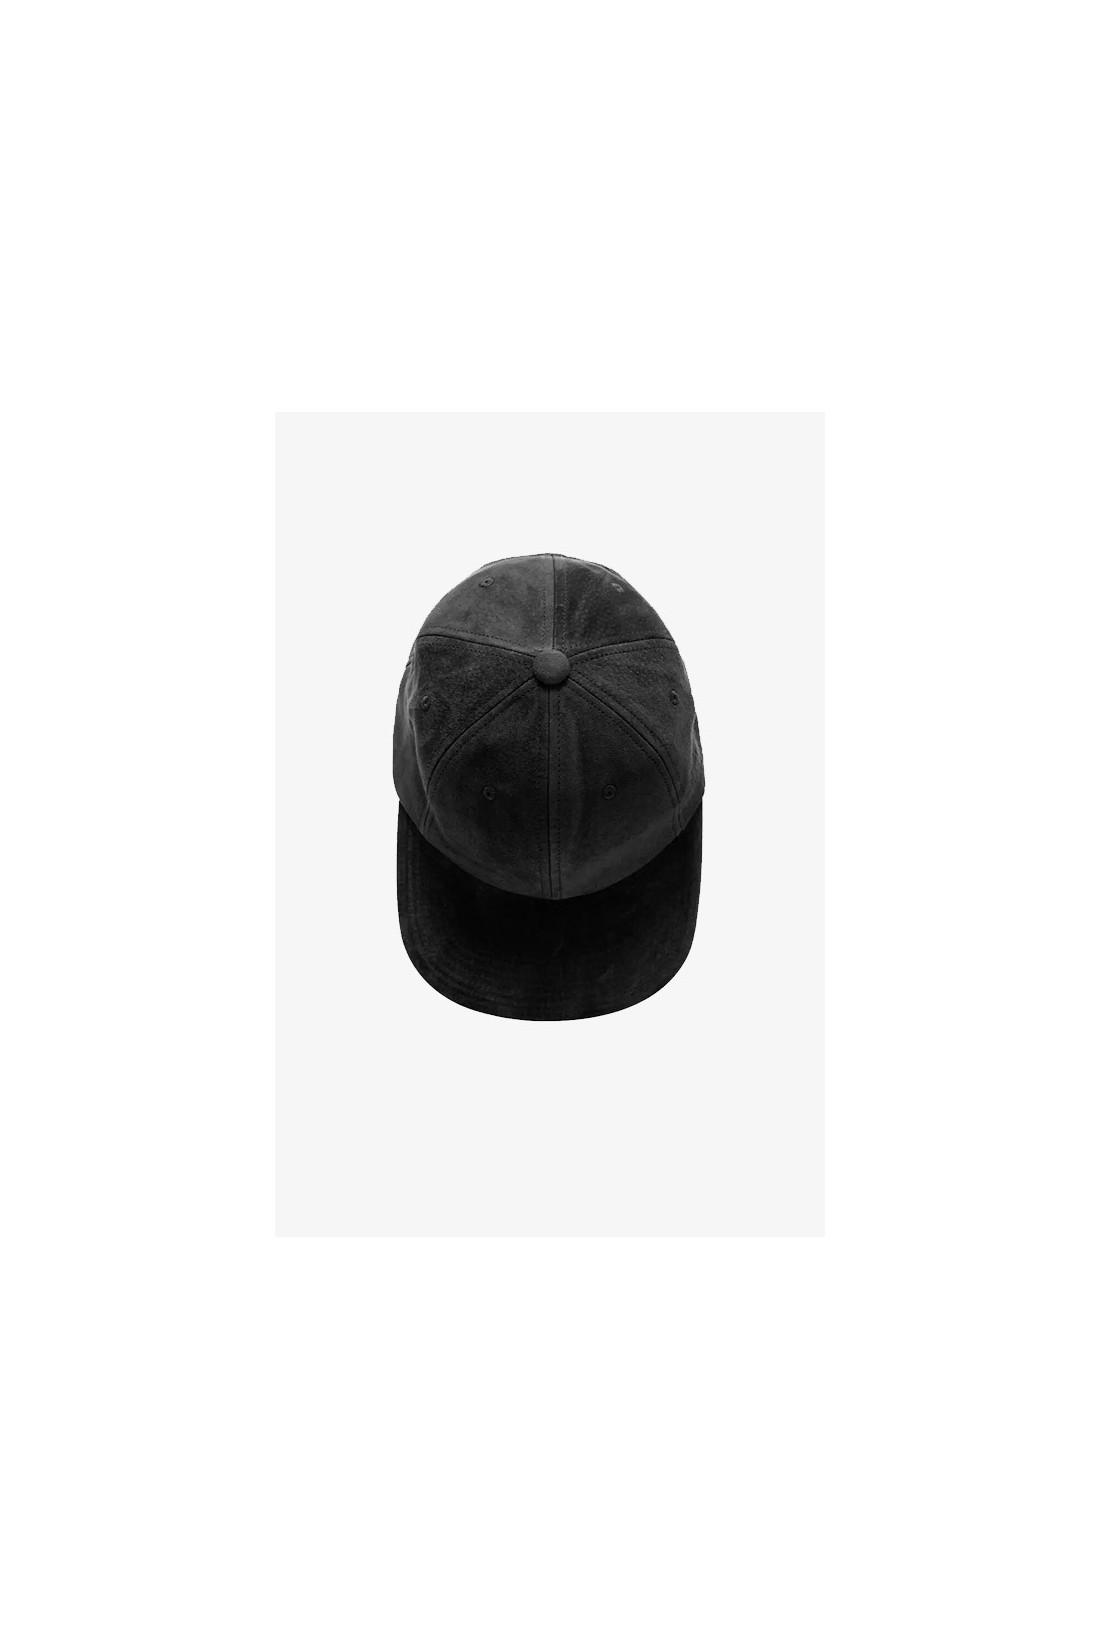 BEAMS PLUS / 6 panel cap suede Black